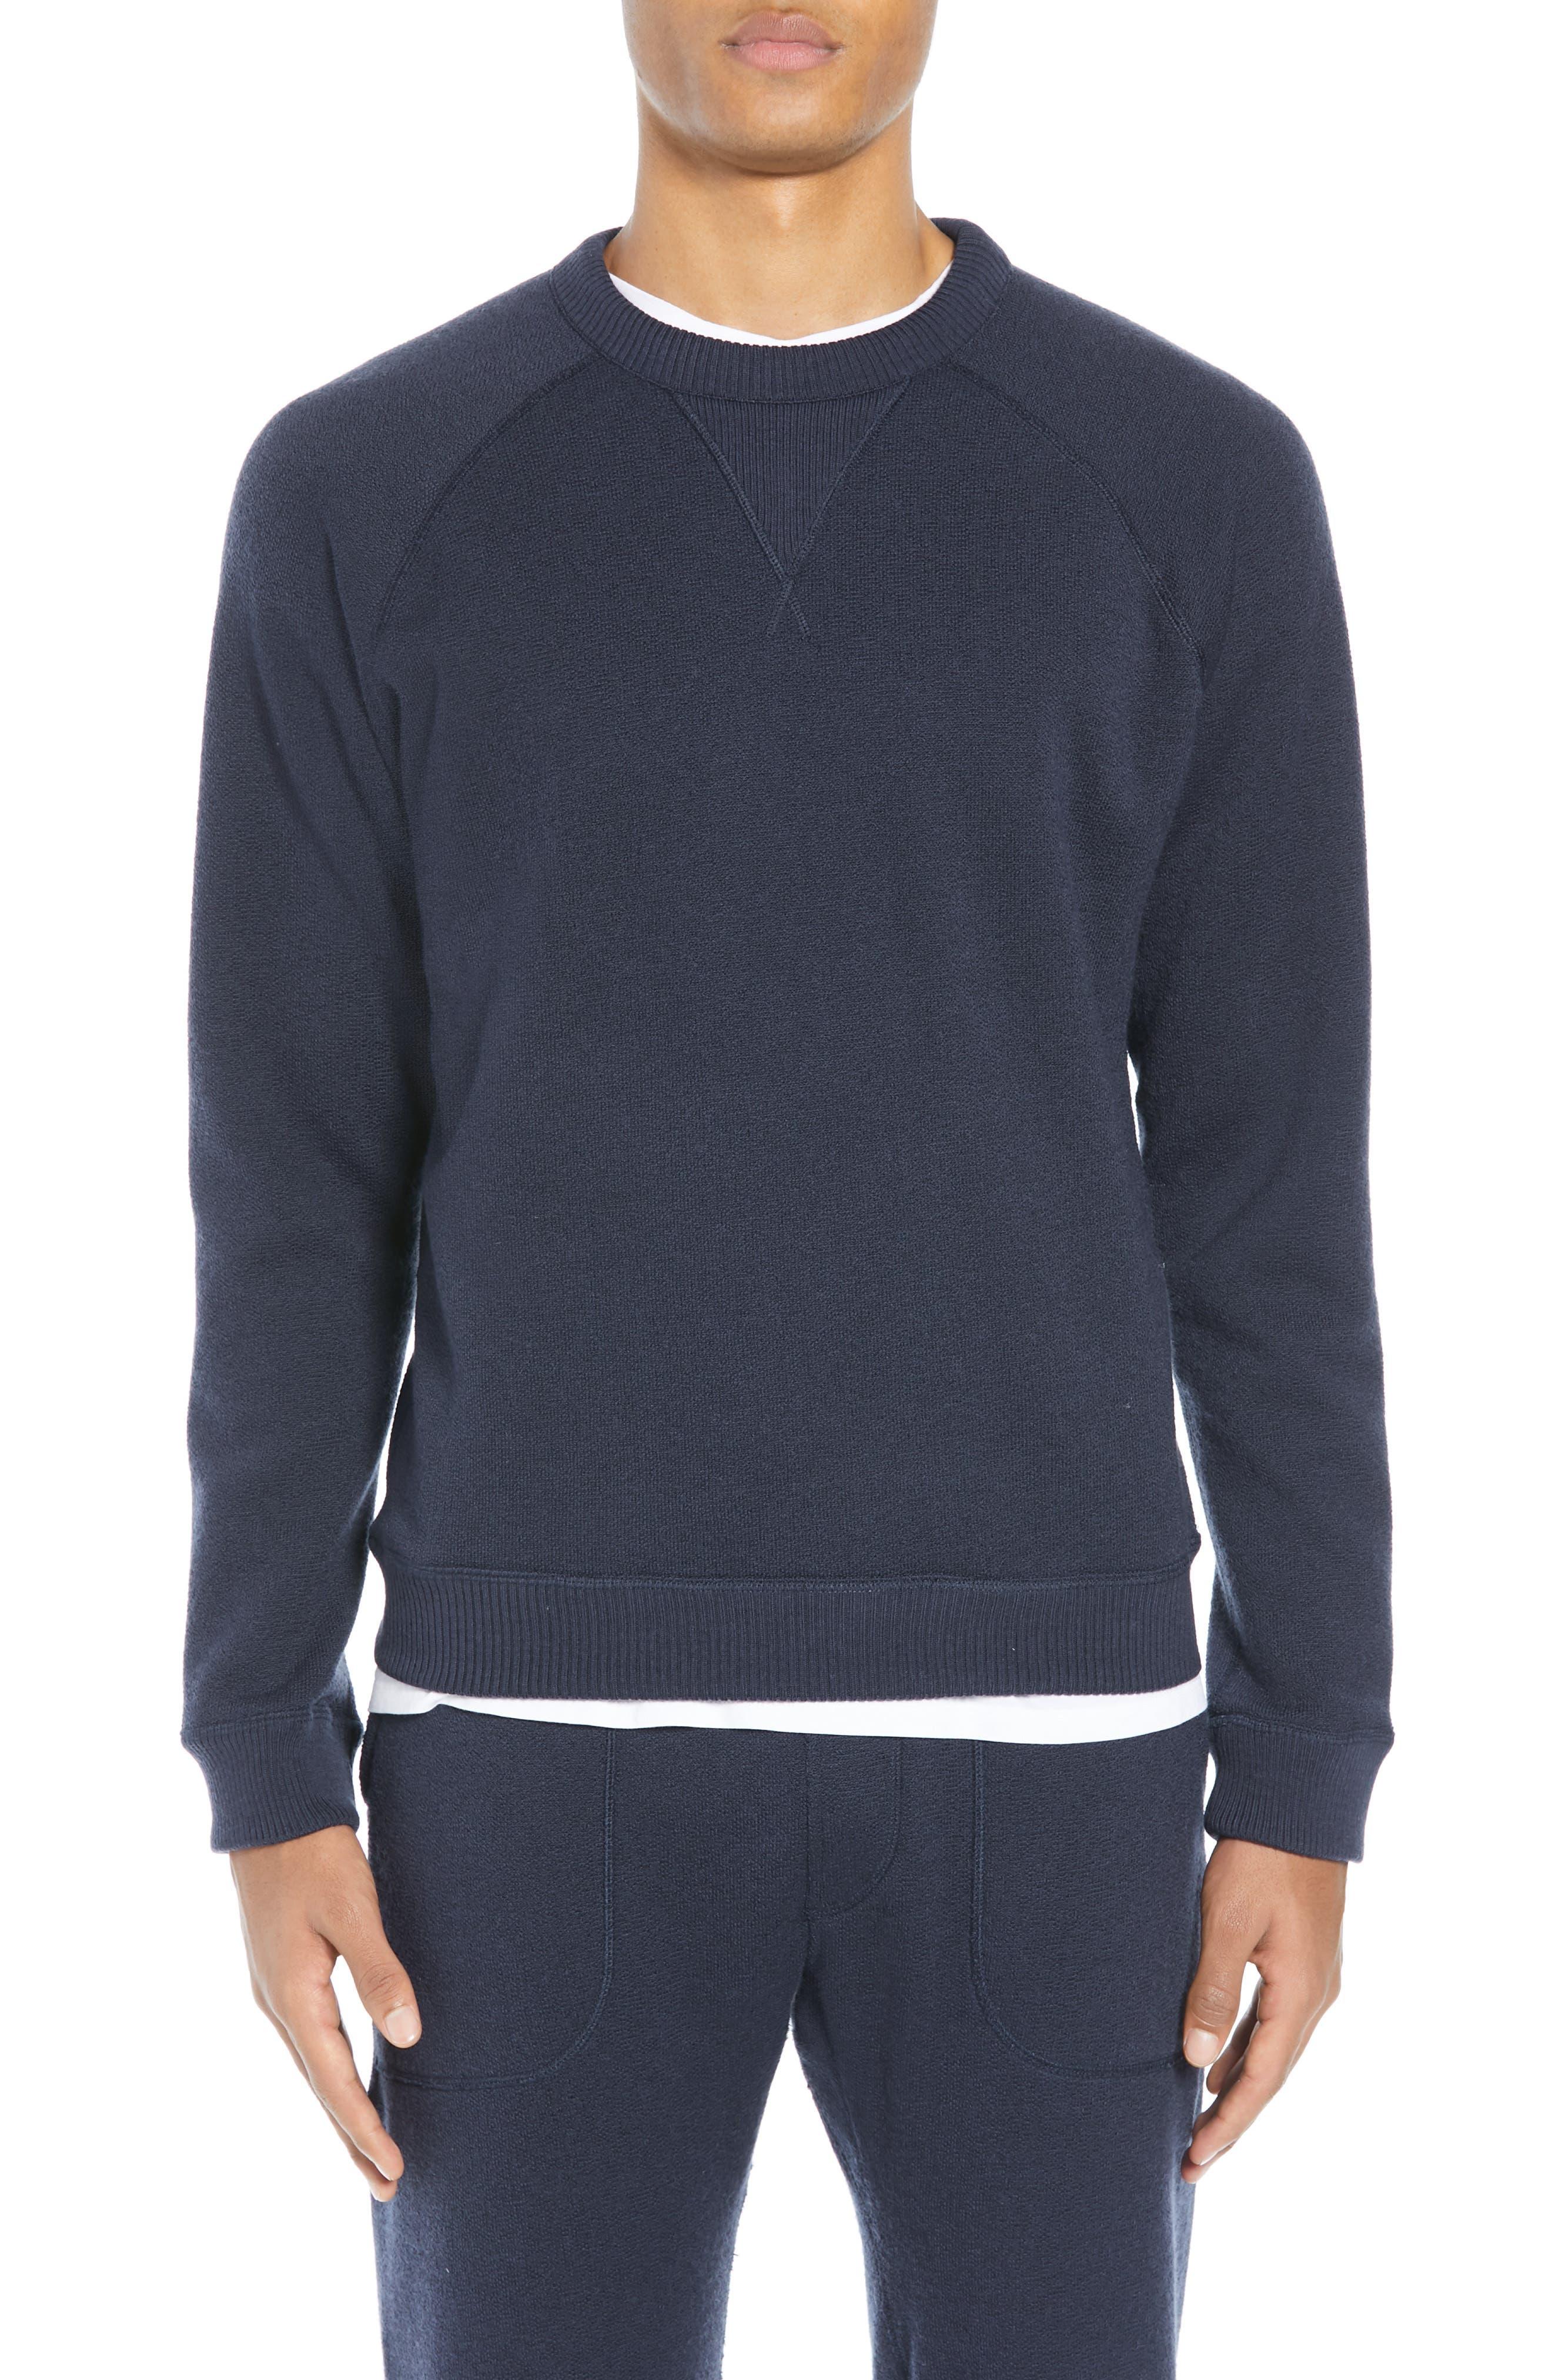 The Merino Wool Fleece Crew Sweatshirt,                             Alternate thumbnail 2, color,                             NAVY